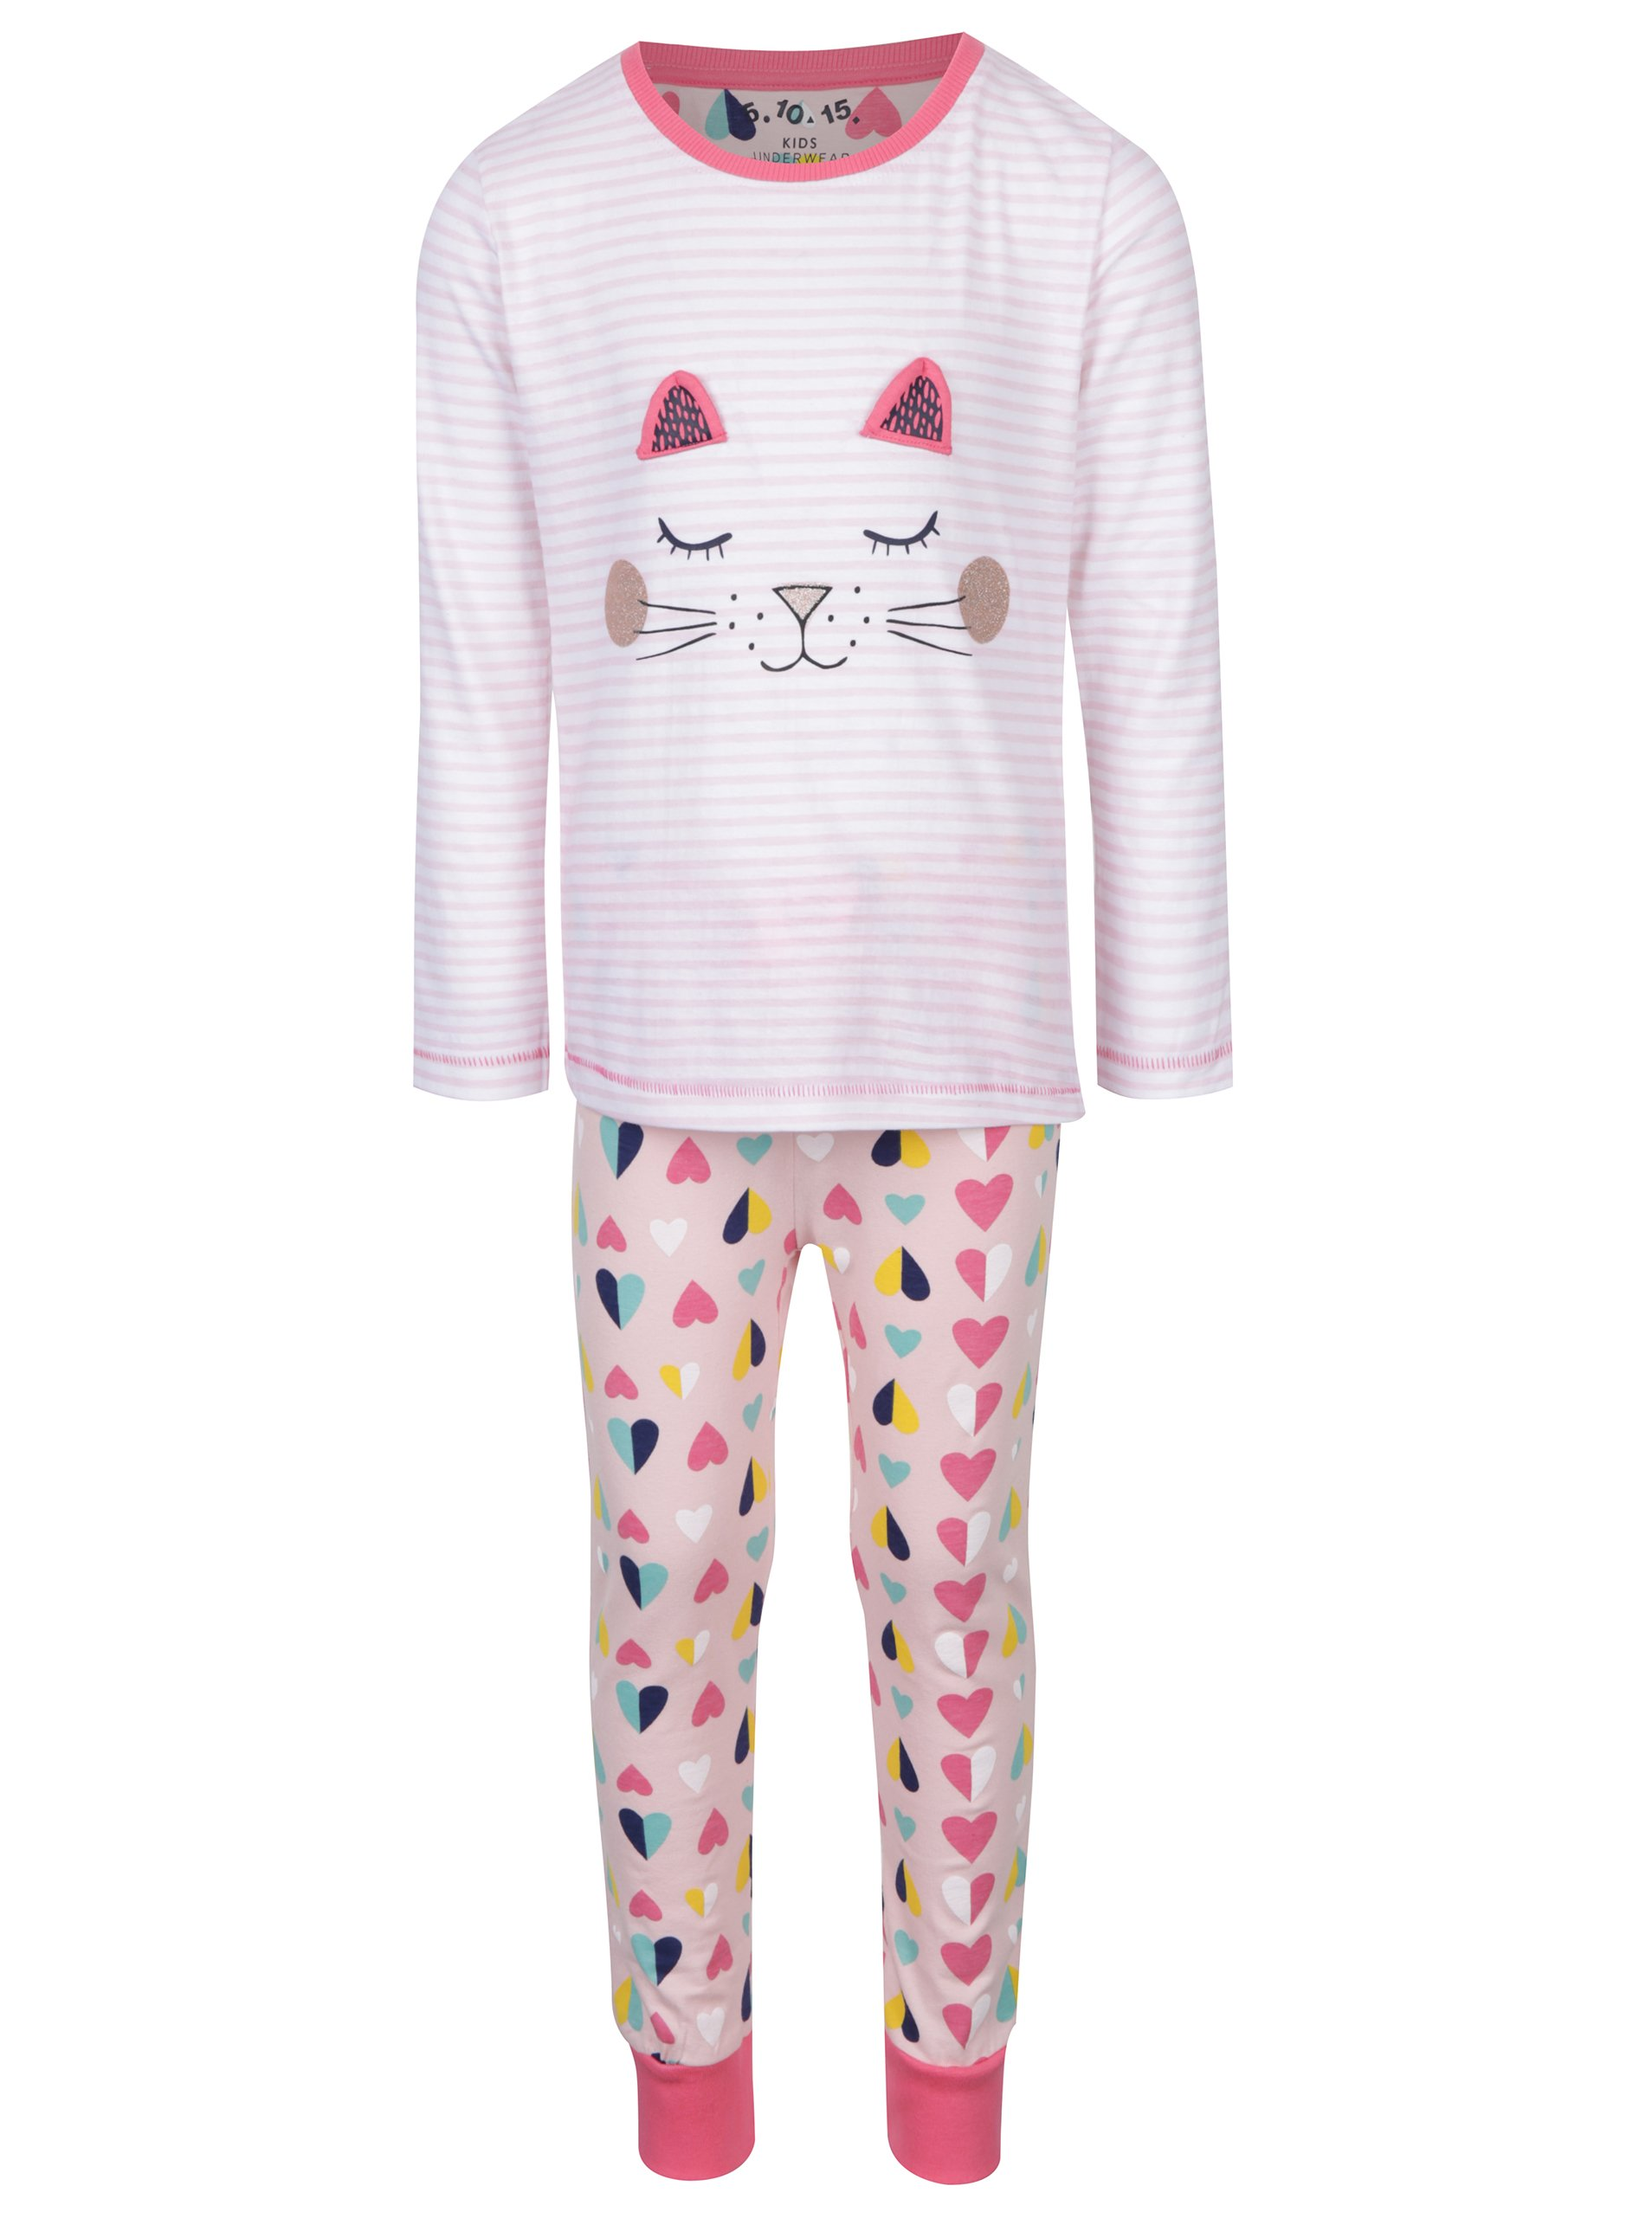 Růžové holčičí pyžamo s motivem kočky 5.10.15.